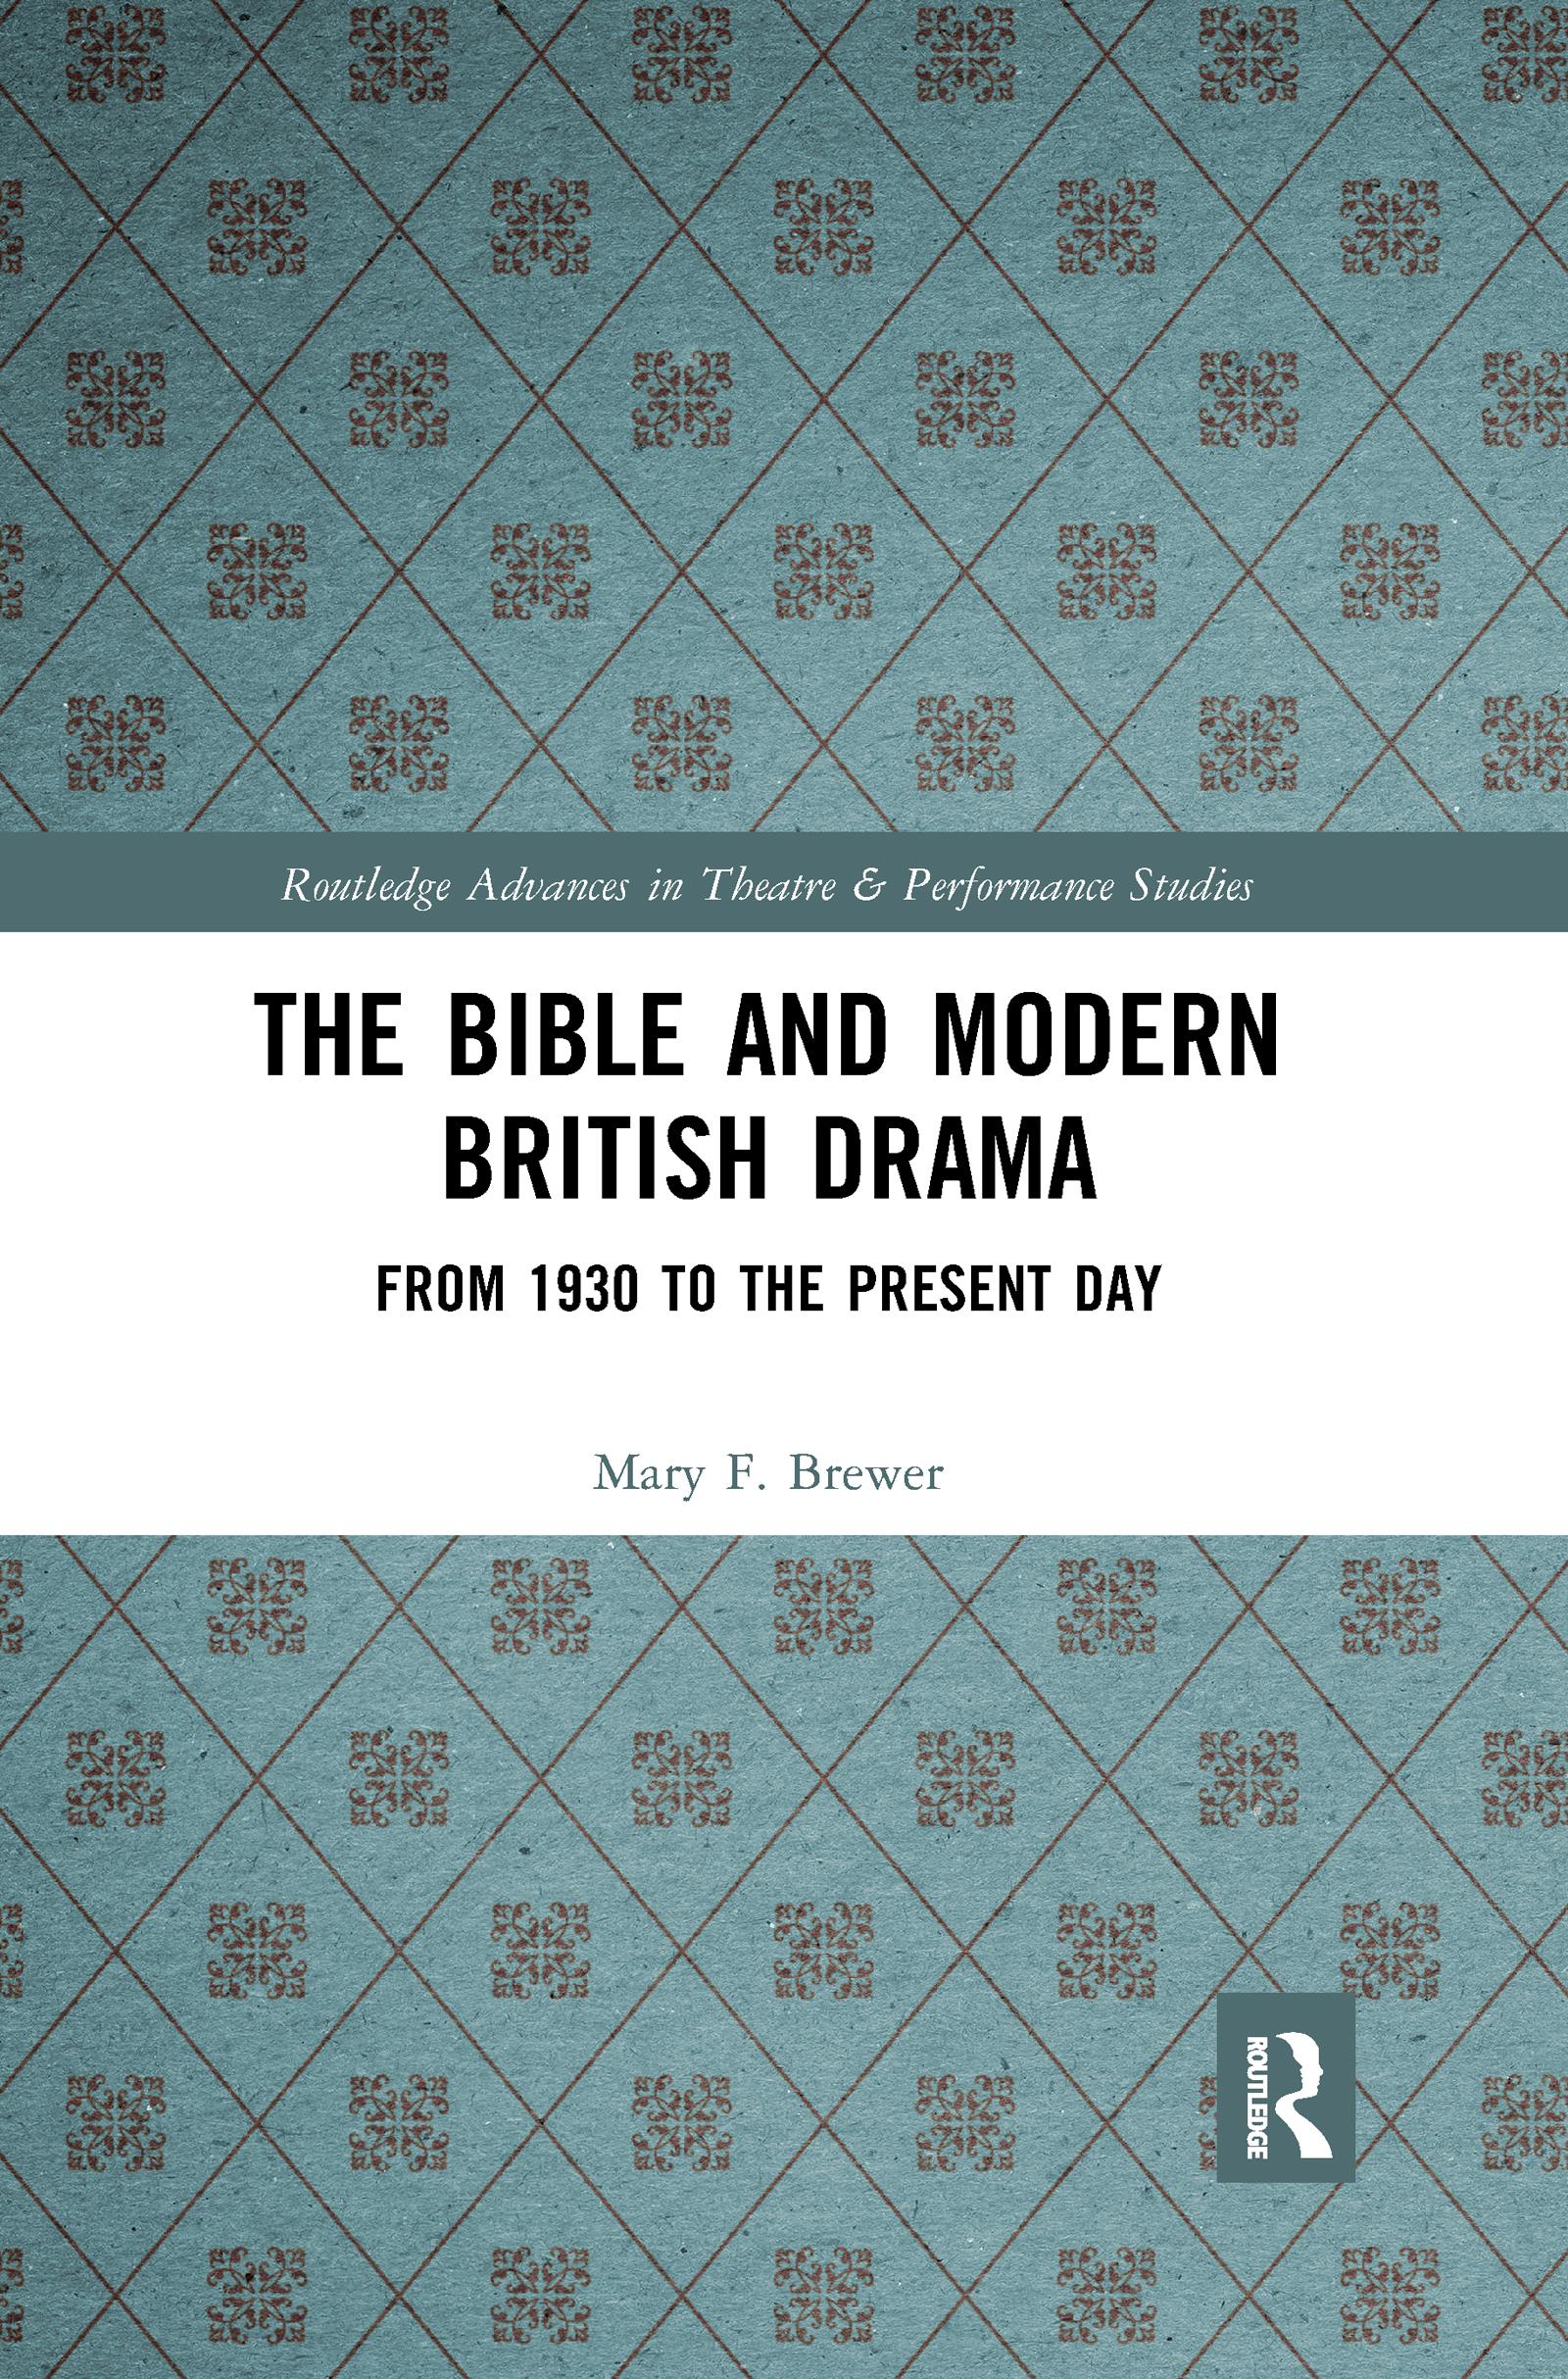 The Bible and Modern British Drama